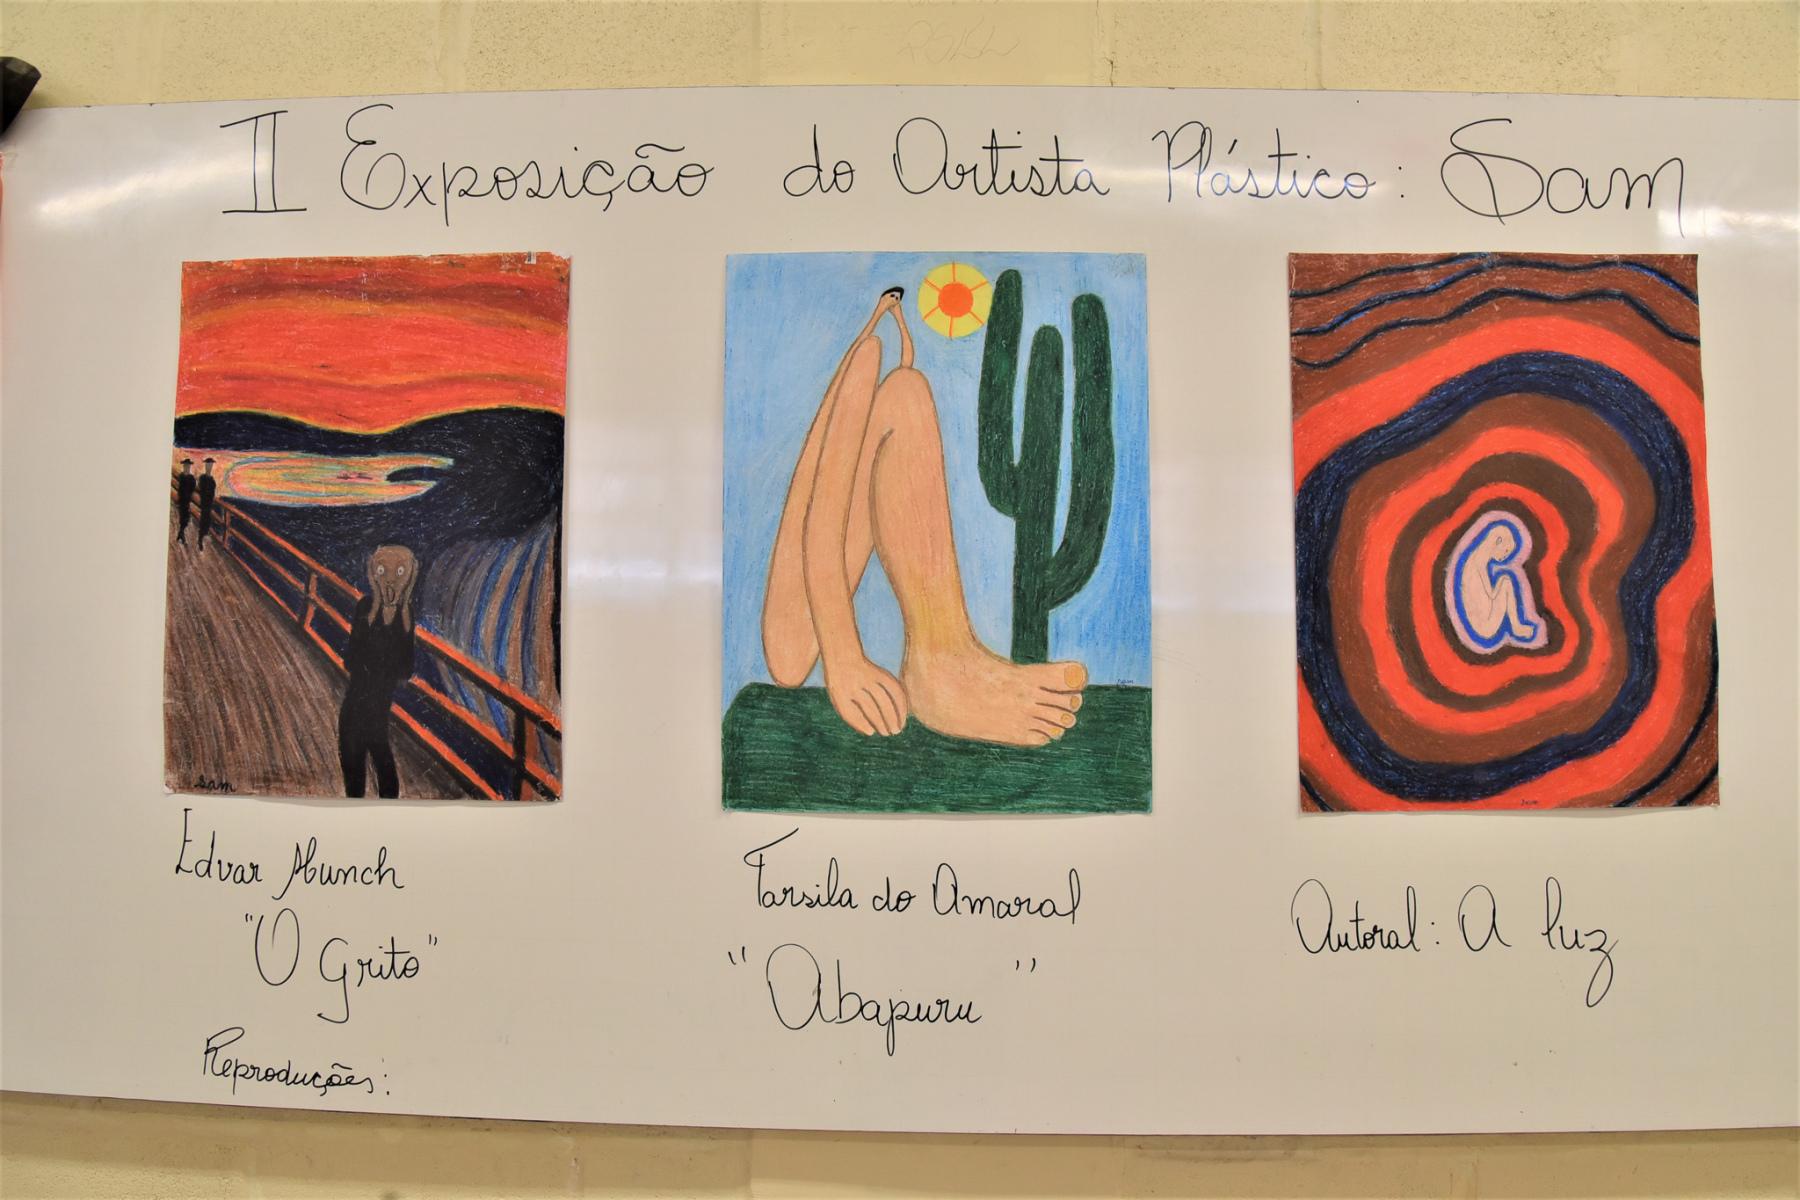 2019.09.12_Exposicao-de-trabalhos-da-Unidade-de-Internacao-de-Santa-Maria-2